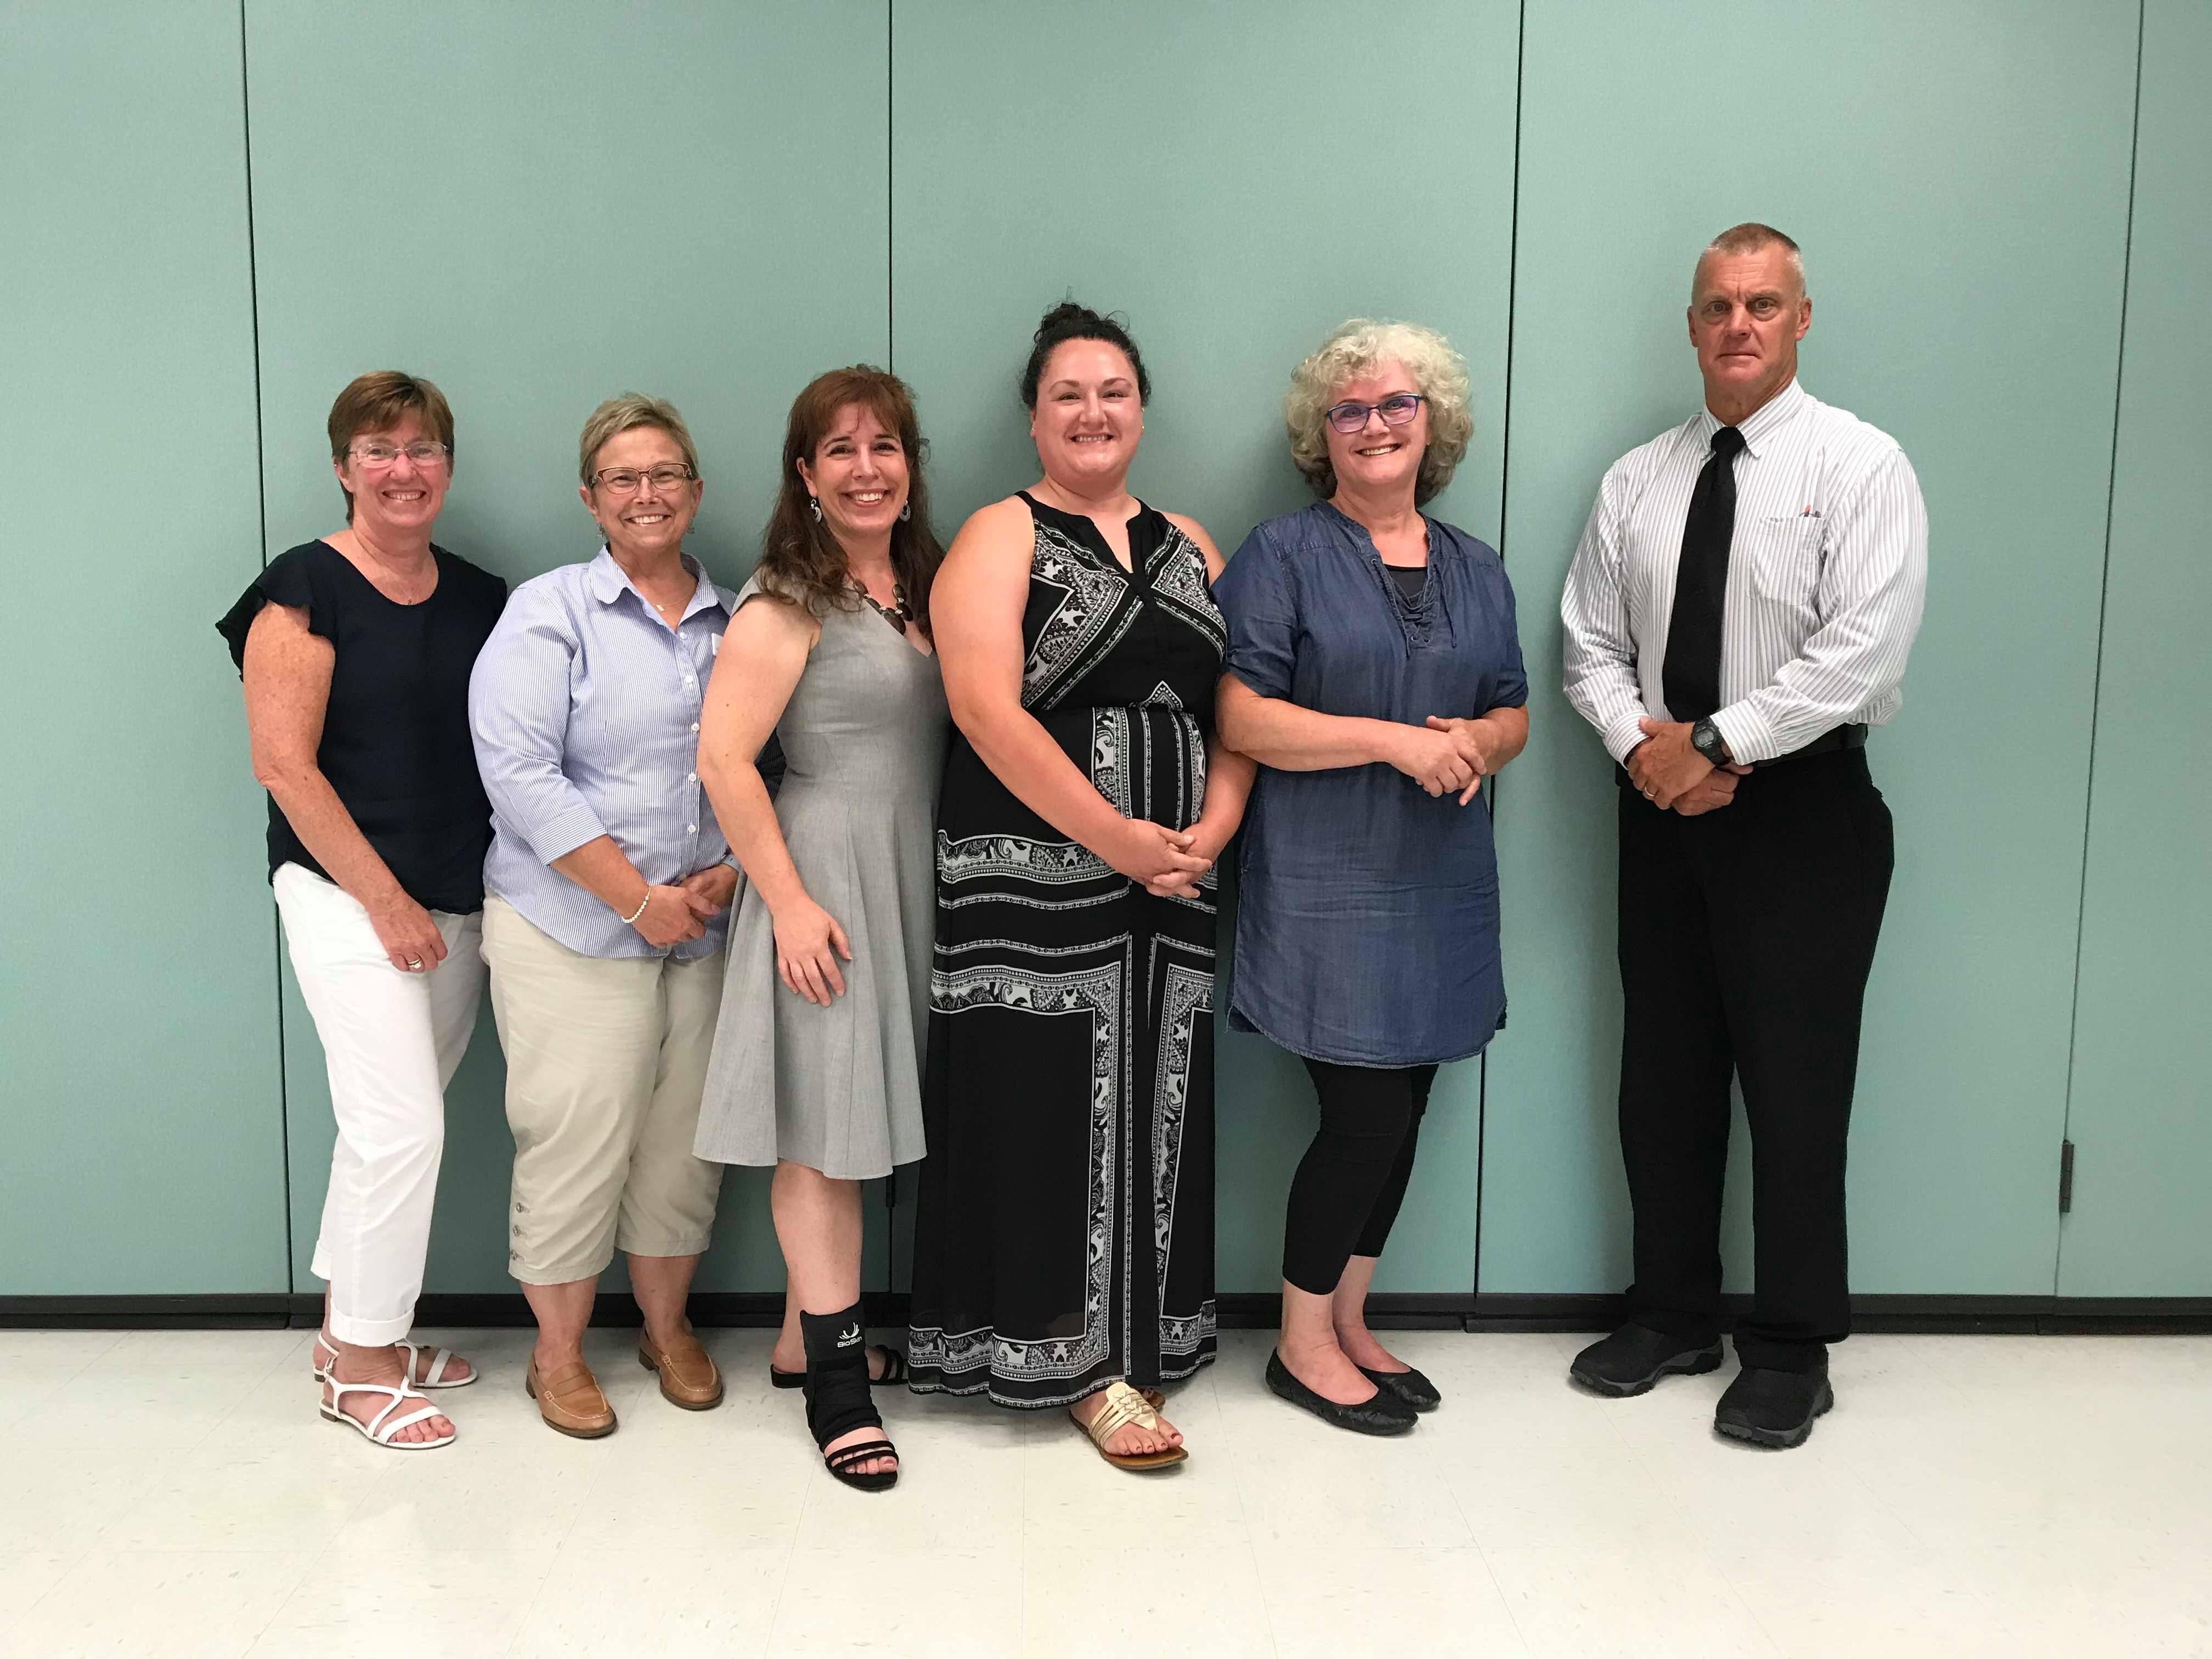 EMCC to expand Nursing Program to the KHEC in East Millinocket